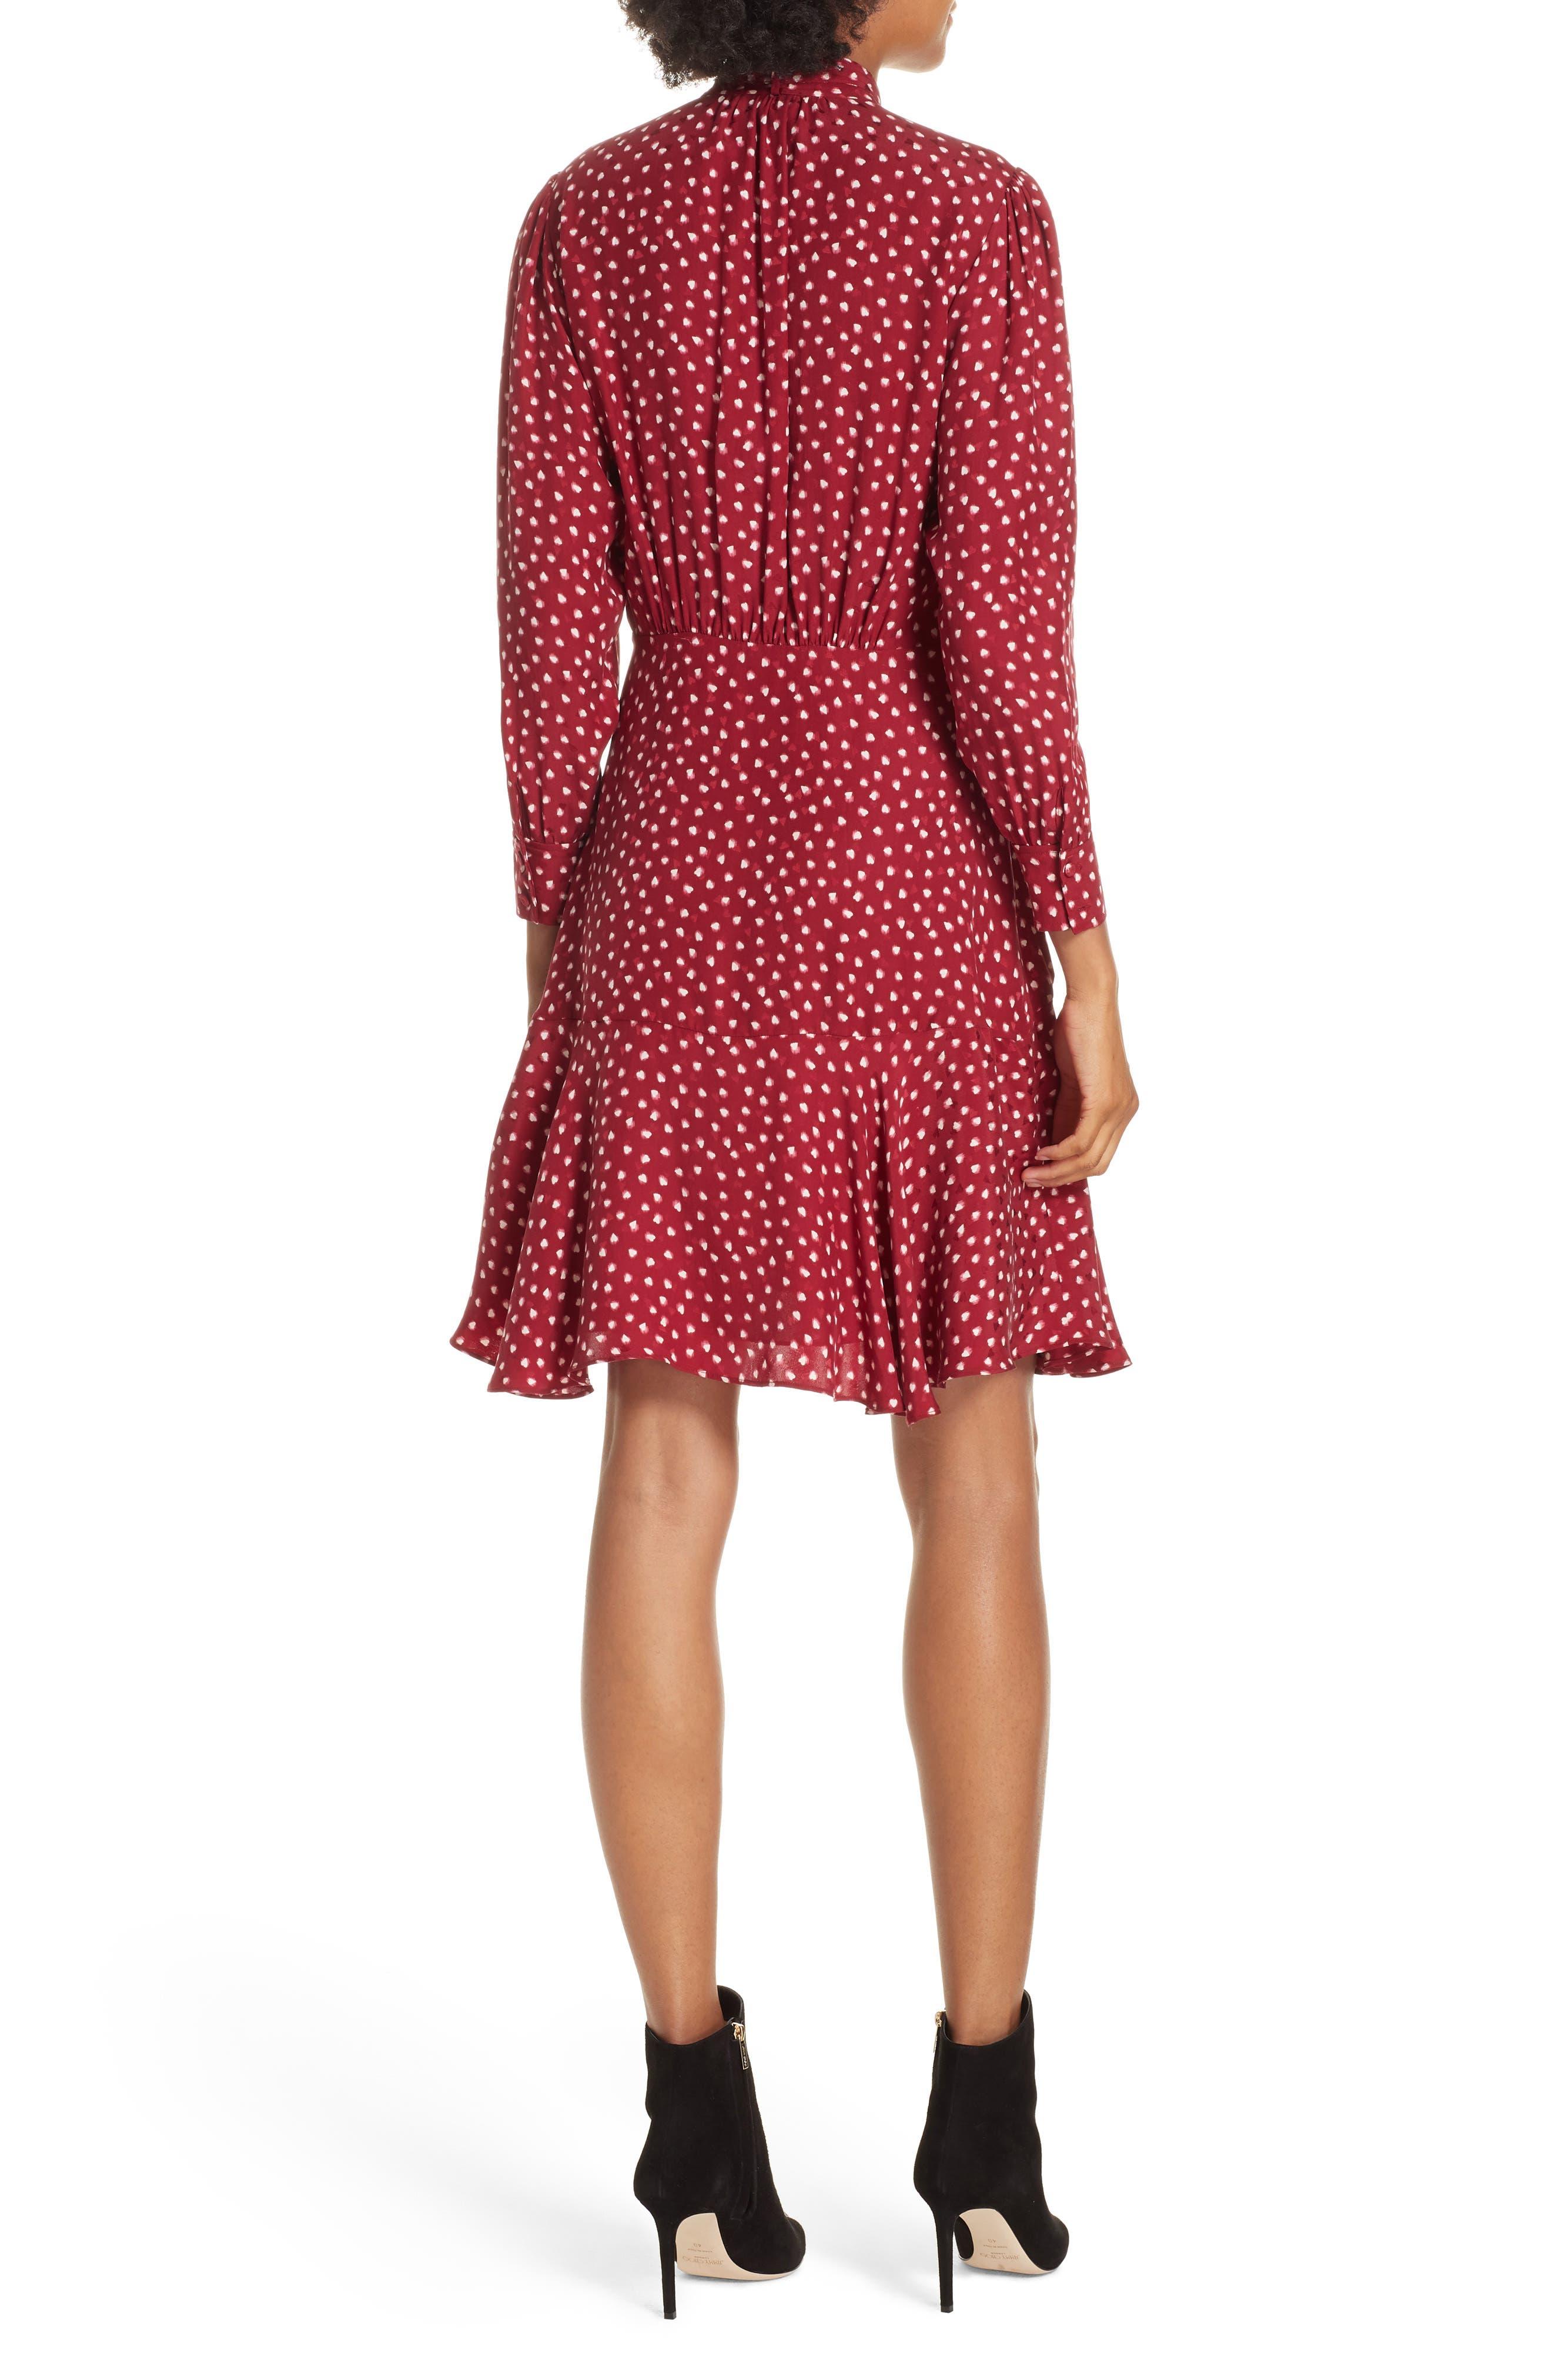 REBECCA TAYLOR,                             Dot Print Fit & Flare Dress,                             Alternate thumbnail 2, color,                             602